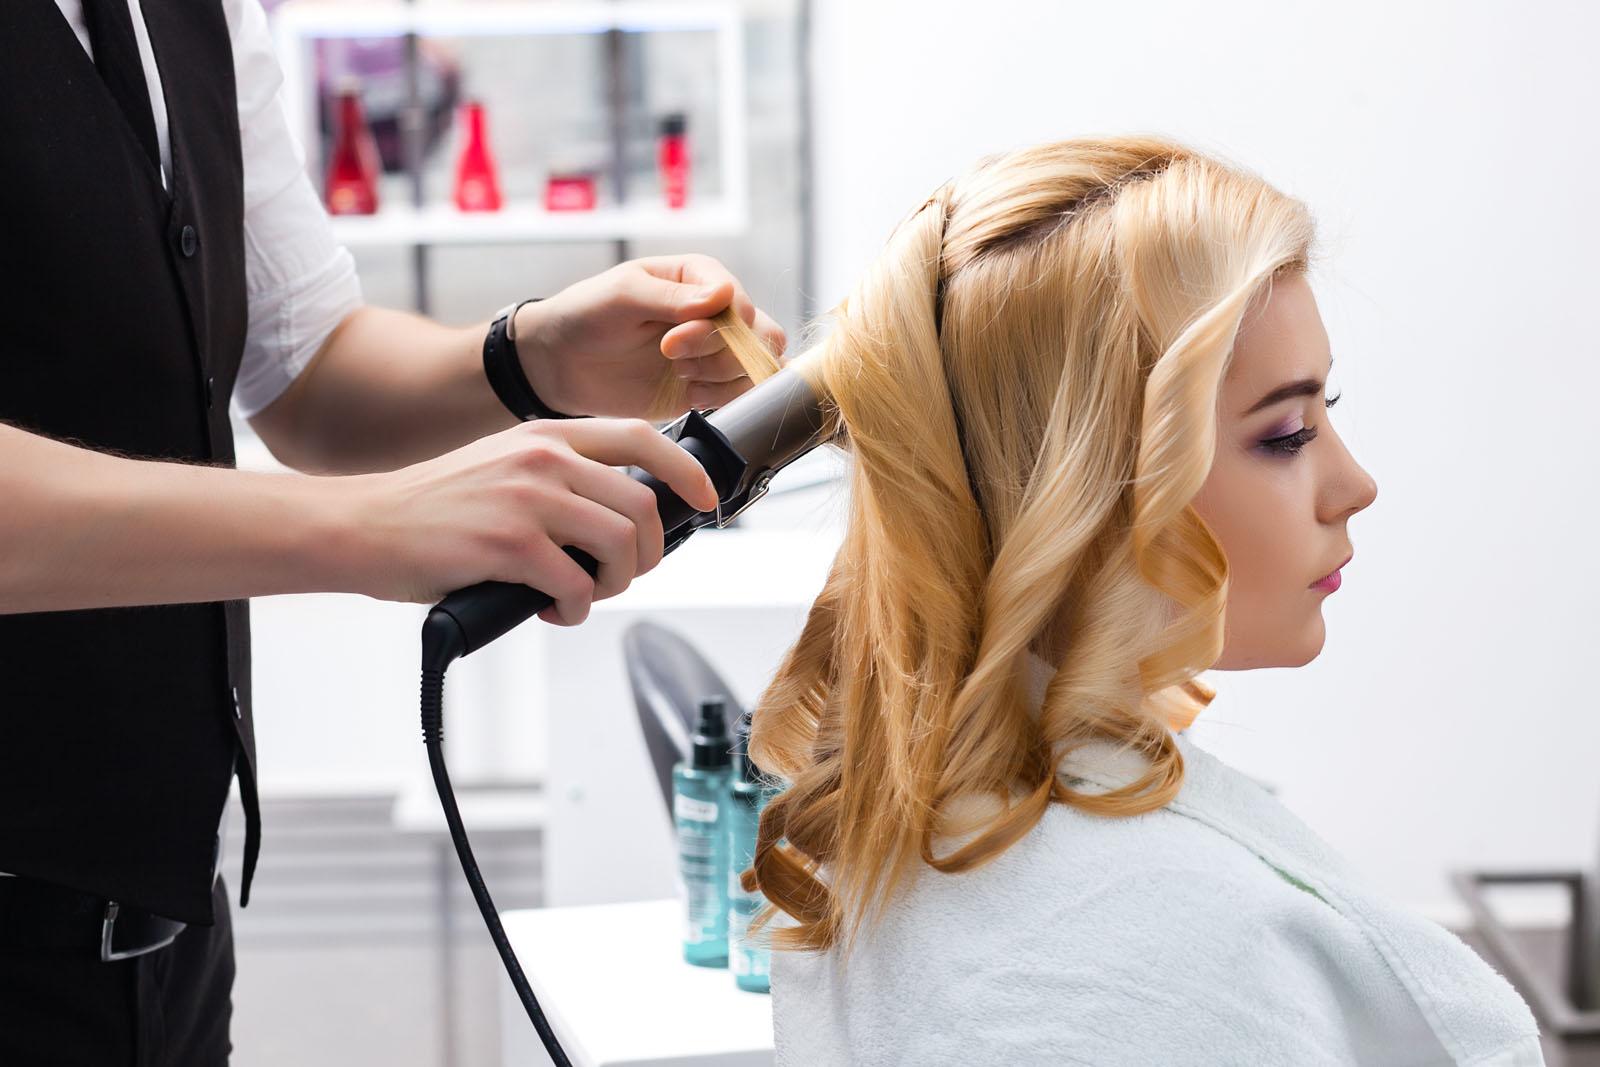 Мужская покраска волос фото для постановки